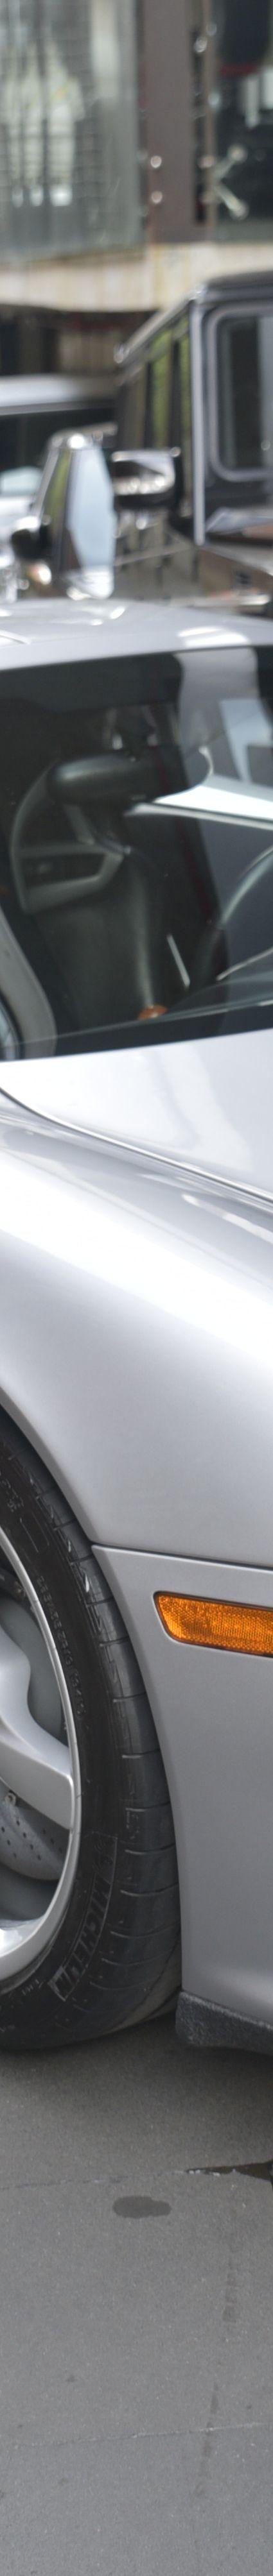 2005 Porsche Carrera GT for sale at Dutton Garage classic modern prestige luxury exotic car collectible motorsport racing sports car